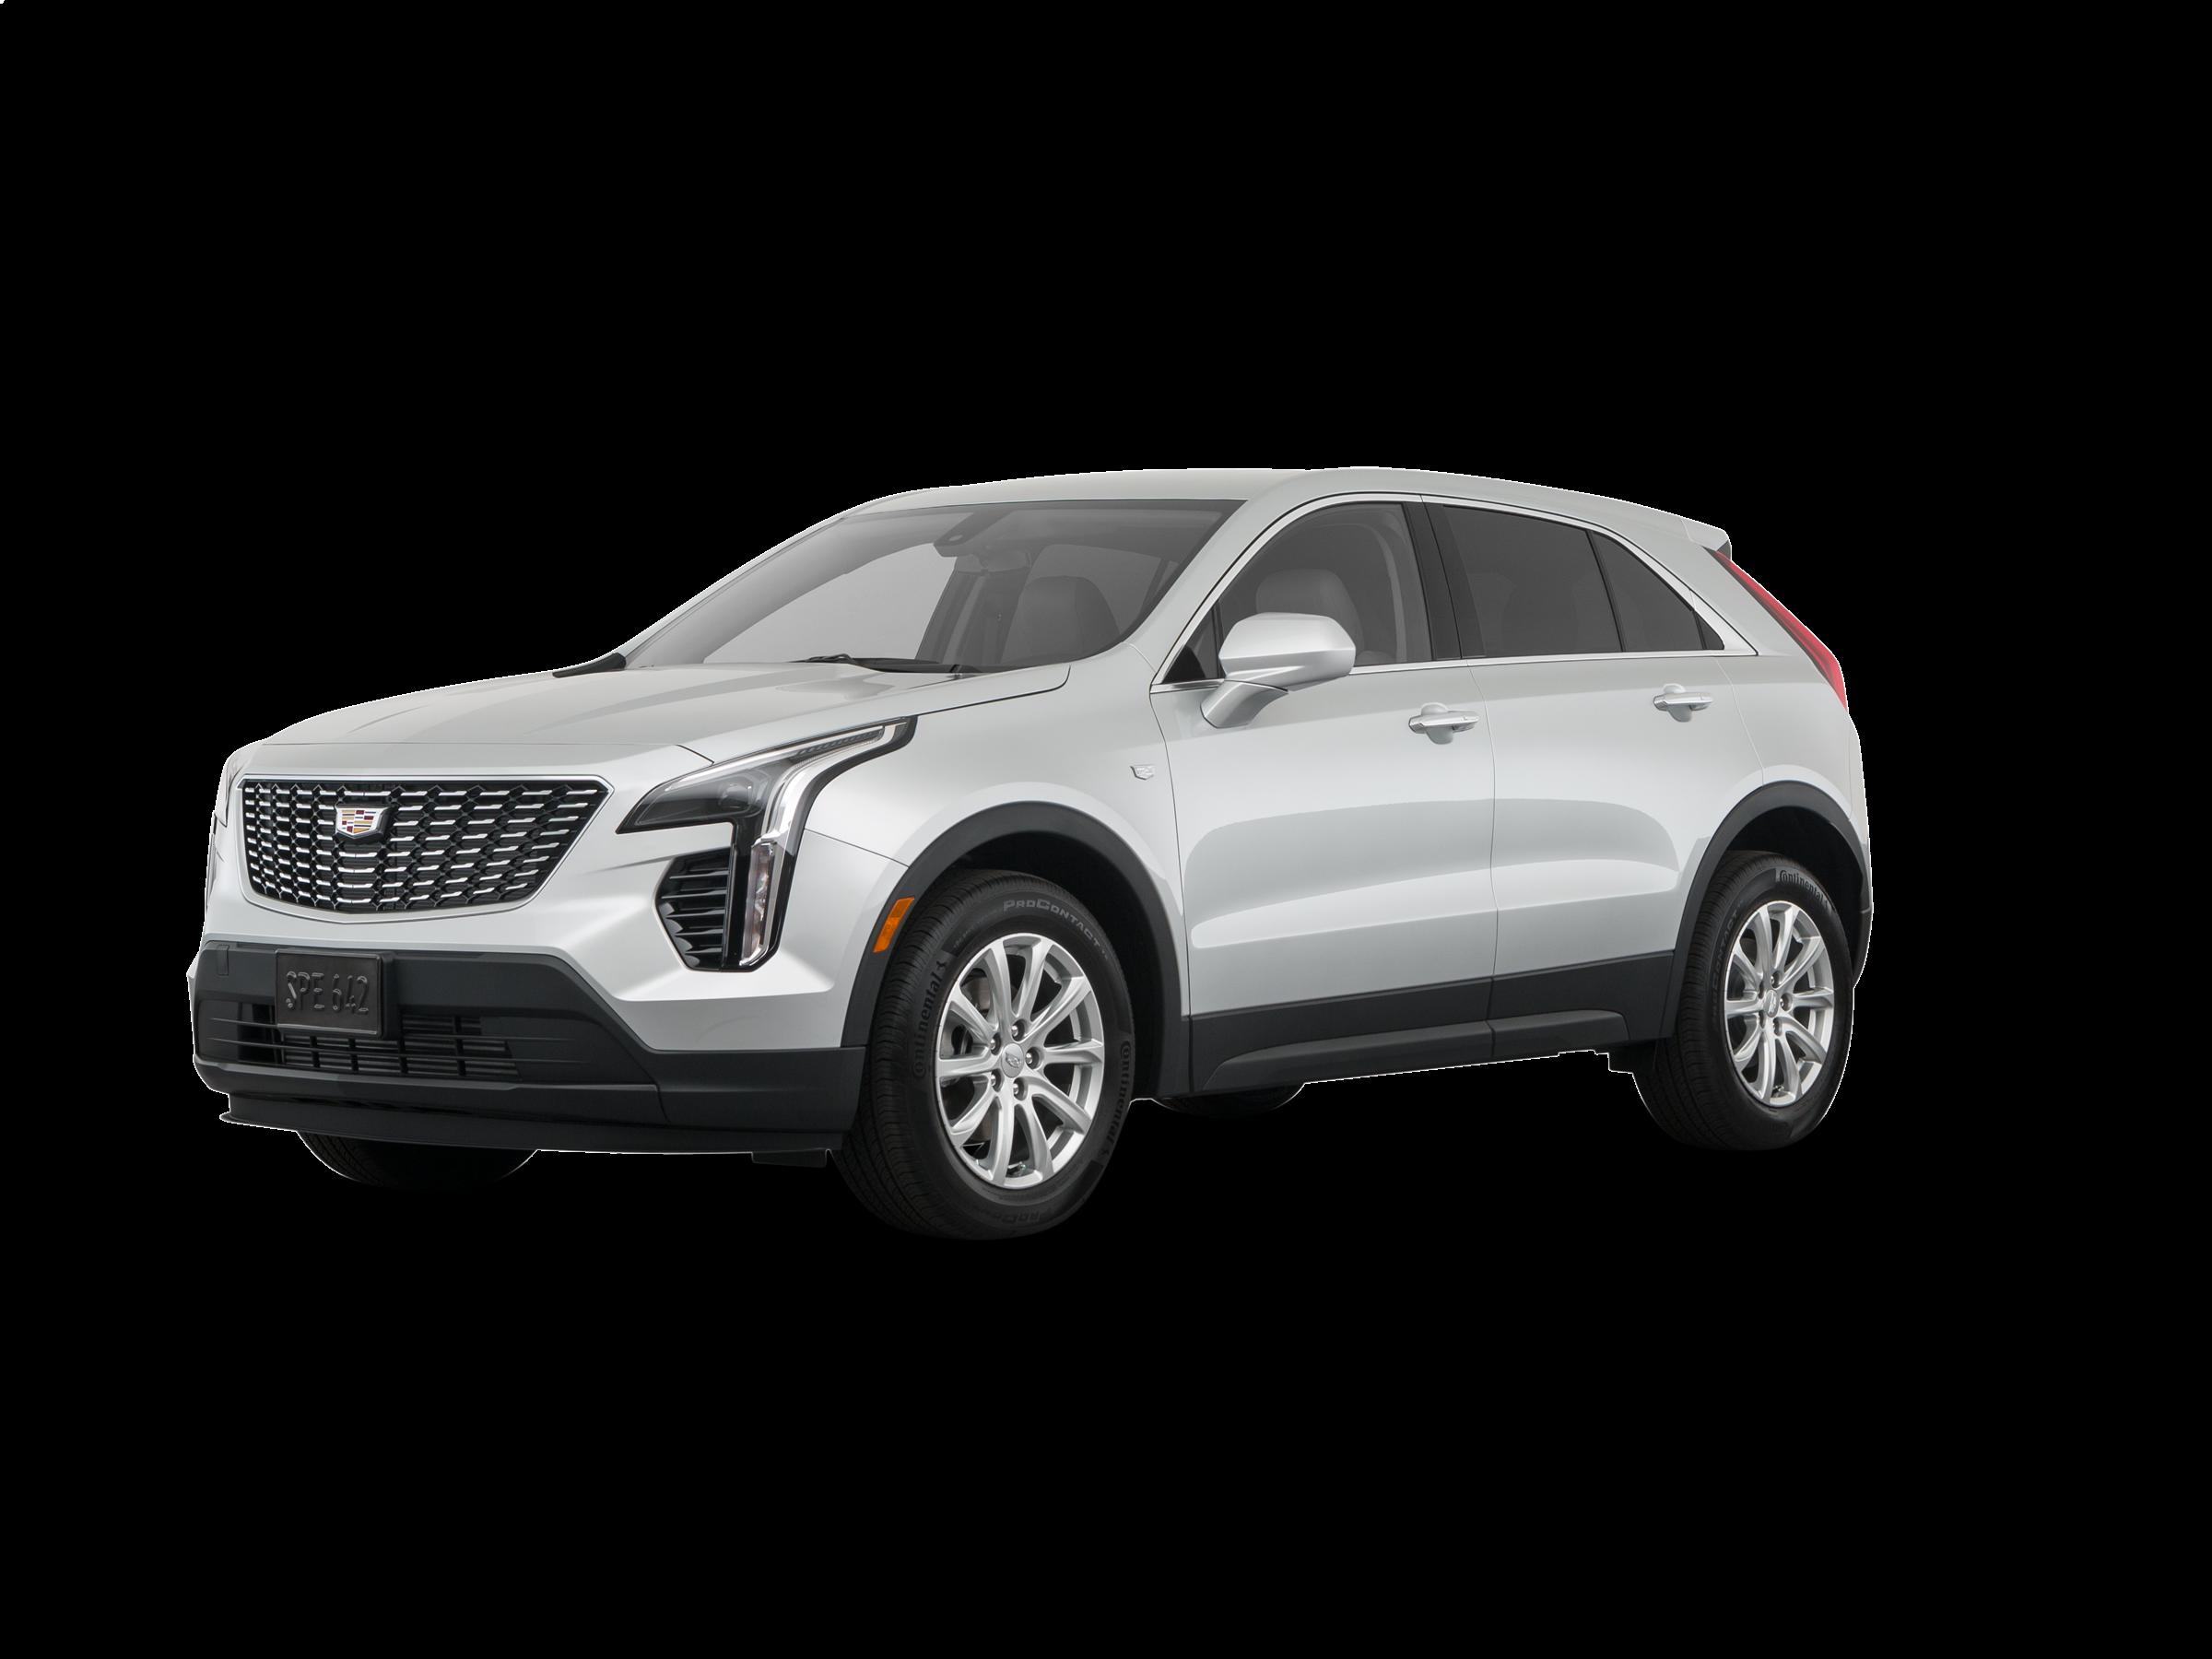 2021 Cadillac Xt4 Reviews Pricing Specs Kelley Blue Book